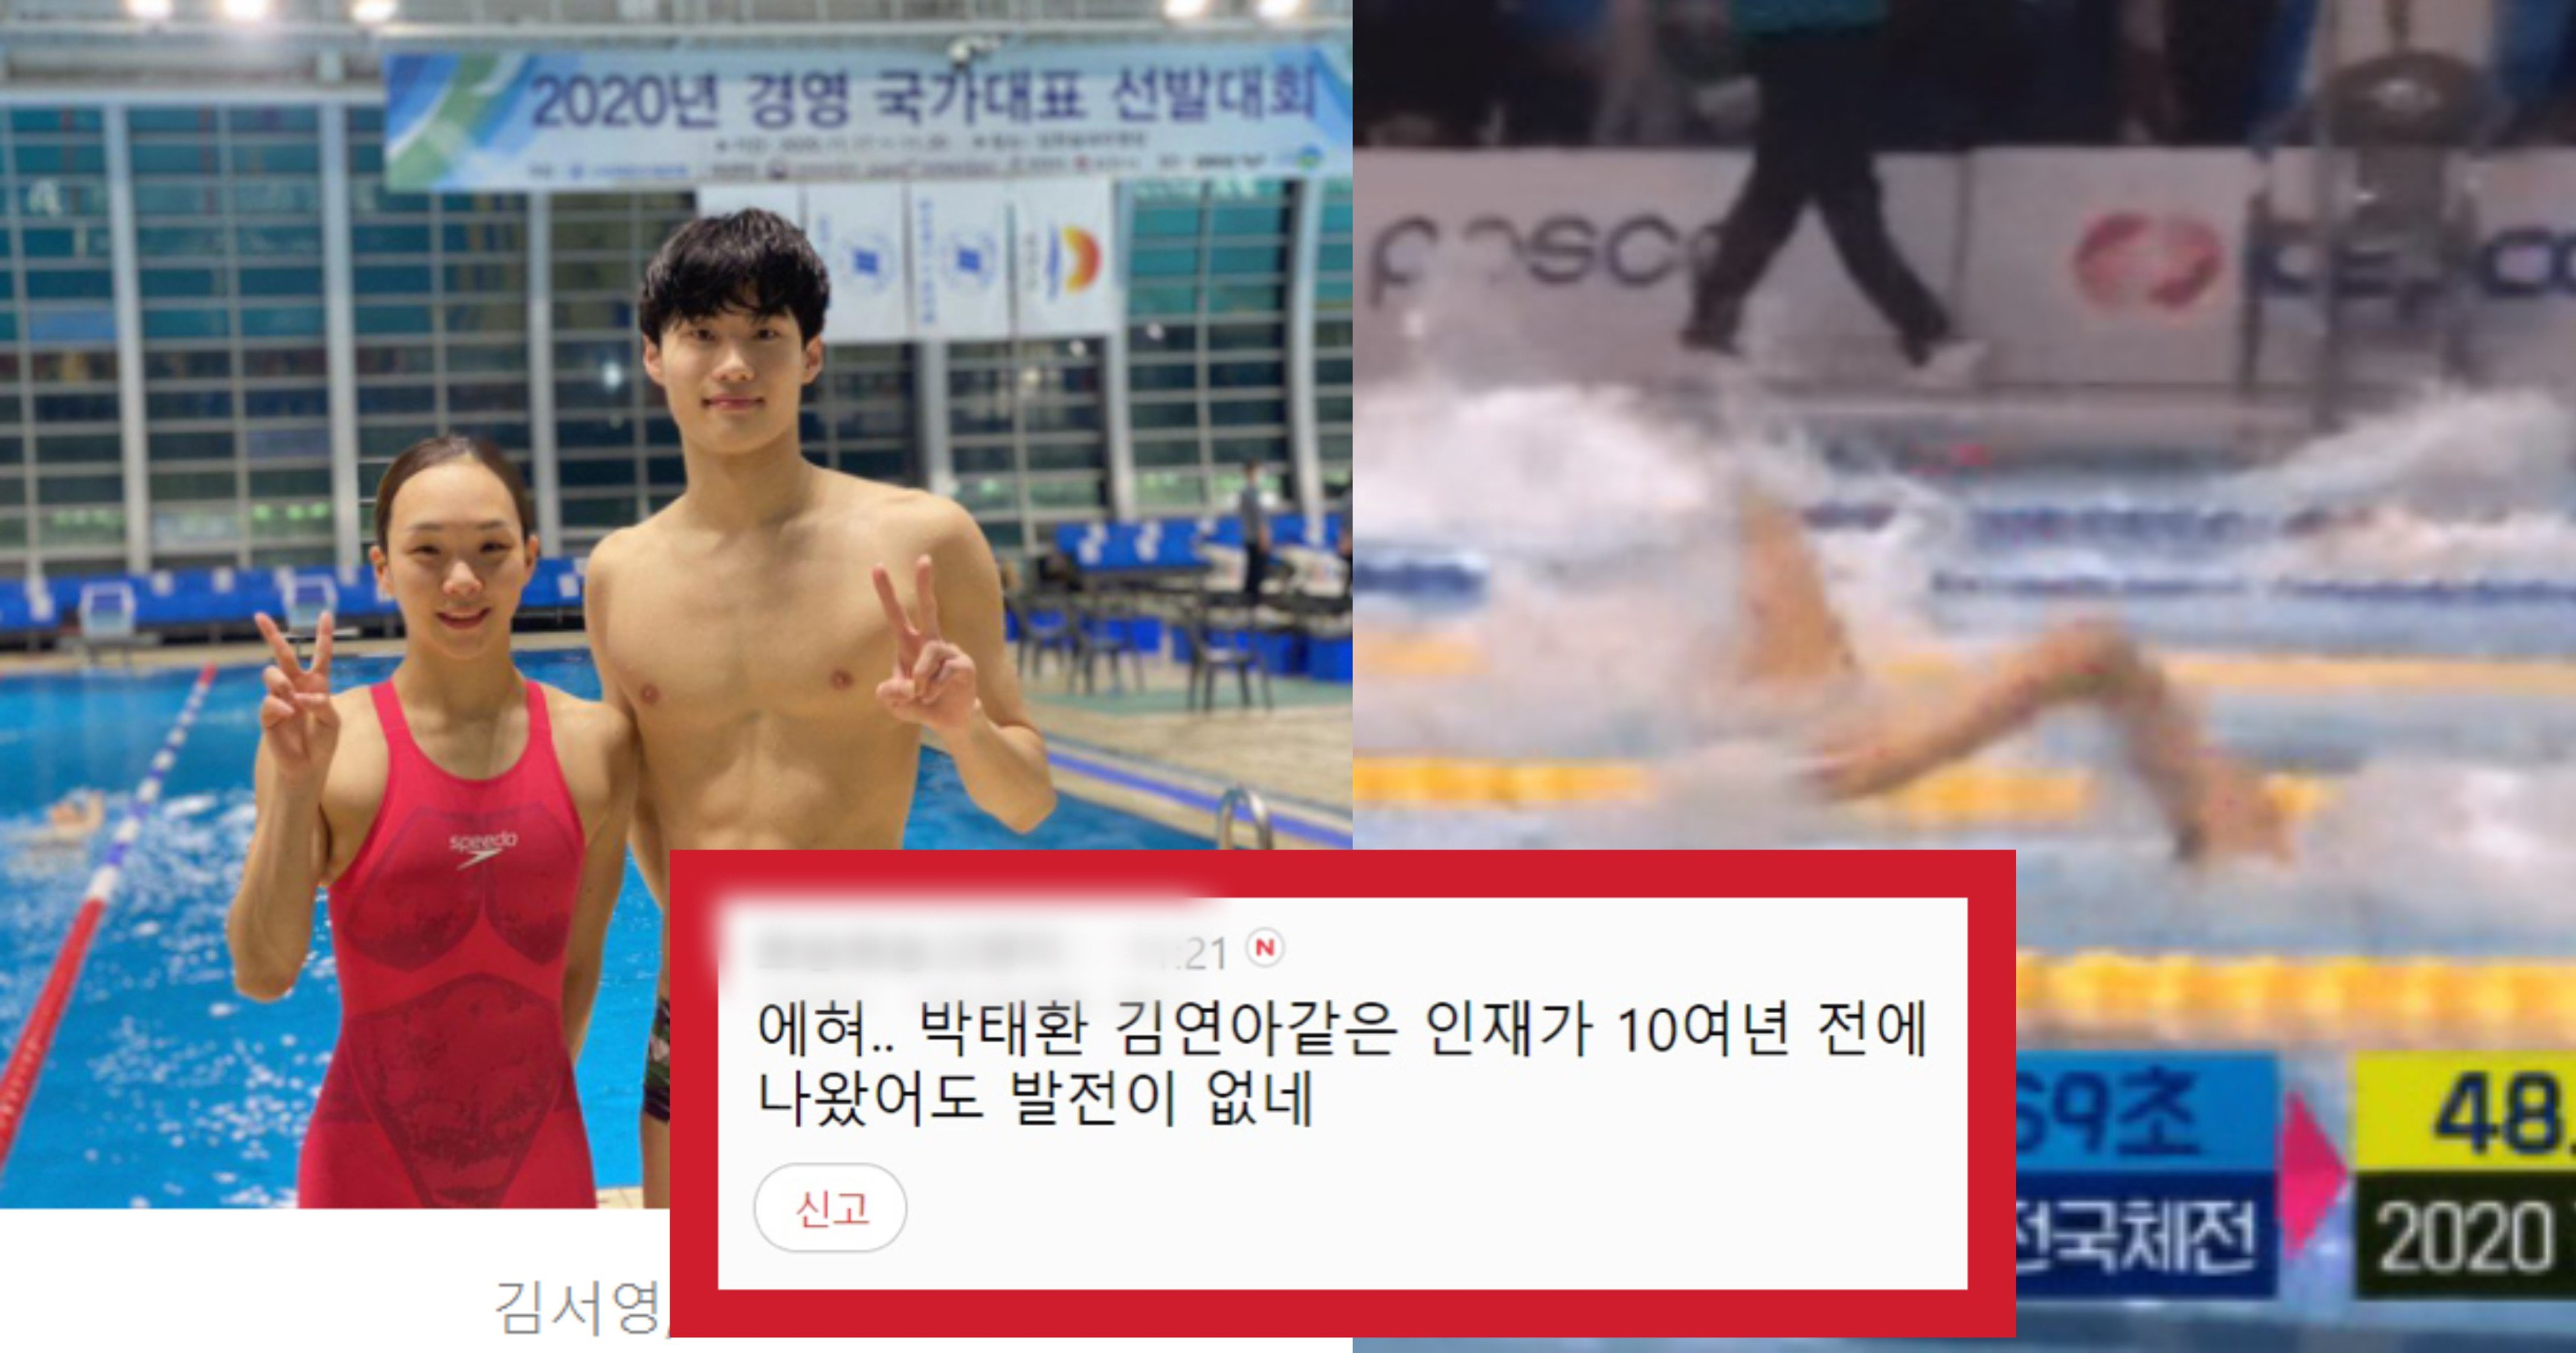 "6473ee94 8dbf 46ef acf2 907ed0b14727.jpeg?resize=412,232 - ""와.. 이건 너무한 거 아닌가..""라며 난리 난 황선우 선수가 올림픽 수영장 적응 훈련을 못한 이유"